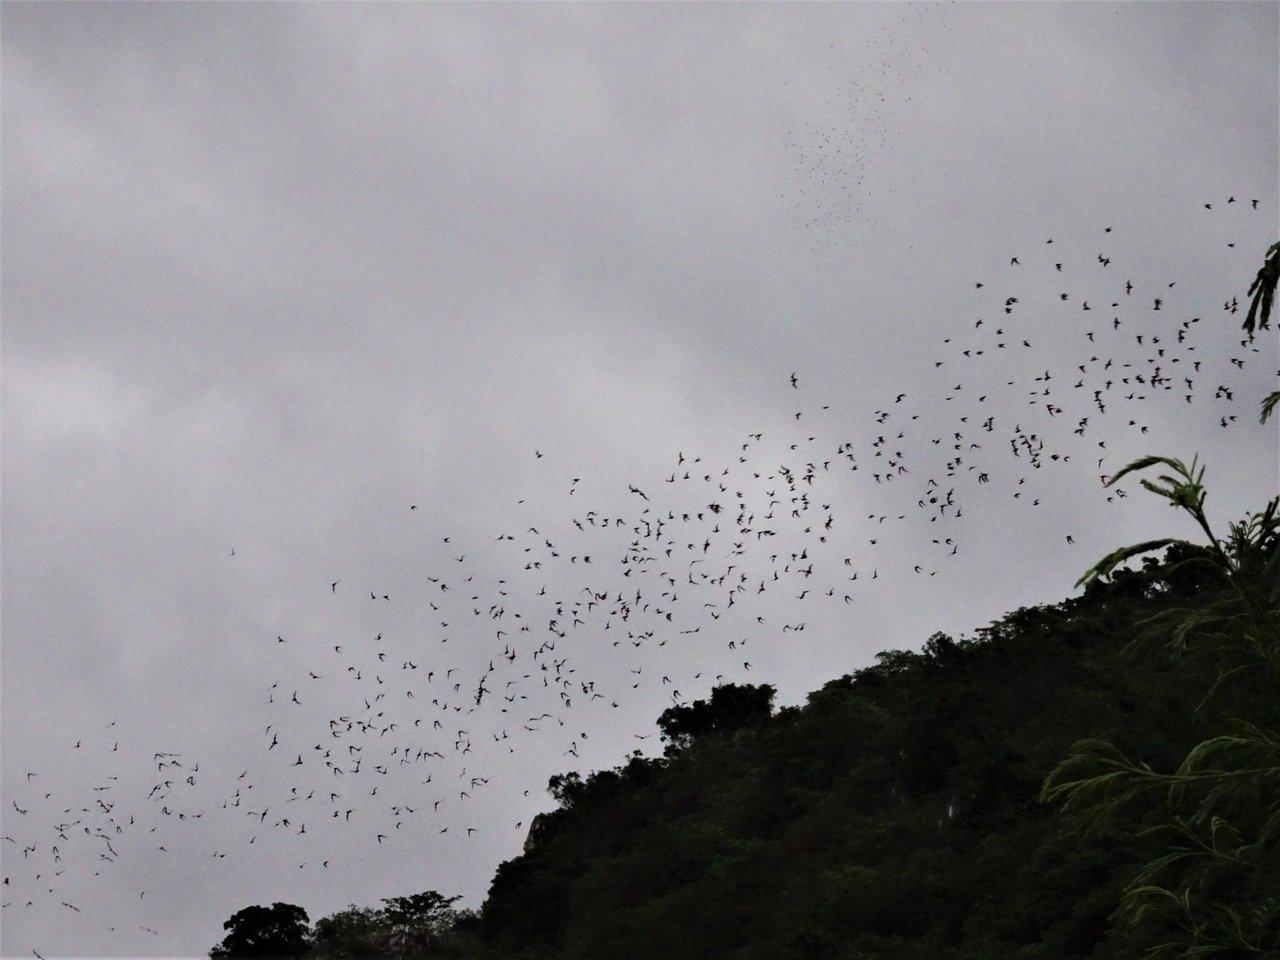 Bats emerging out